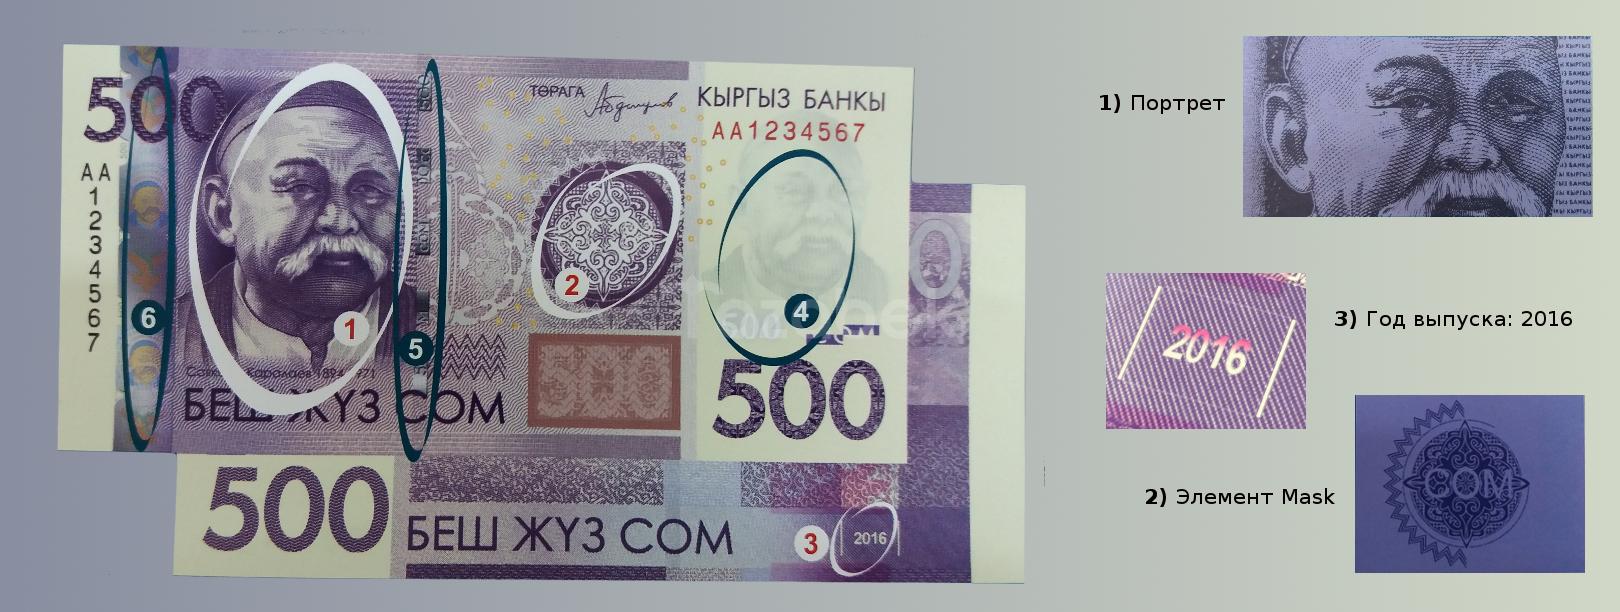 Валюта Кыргызстана - банкнота номиналом 500 сомов образца 2017 года. АКИpress